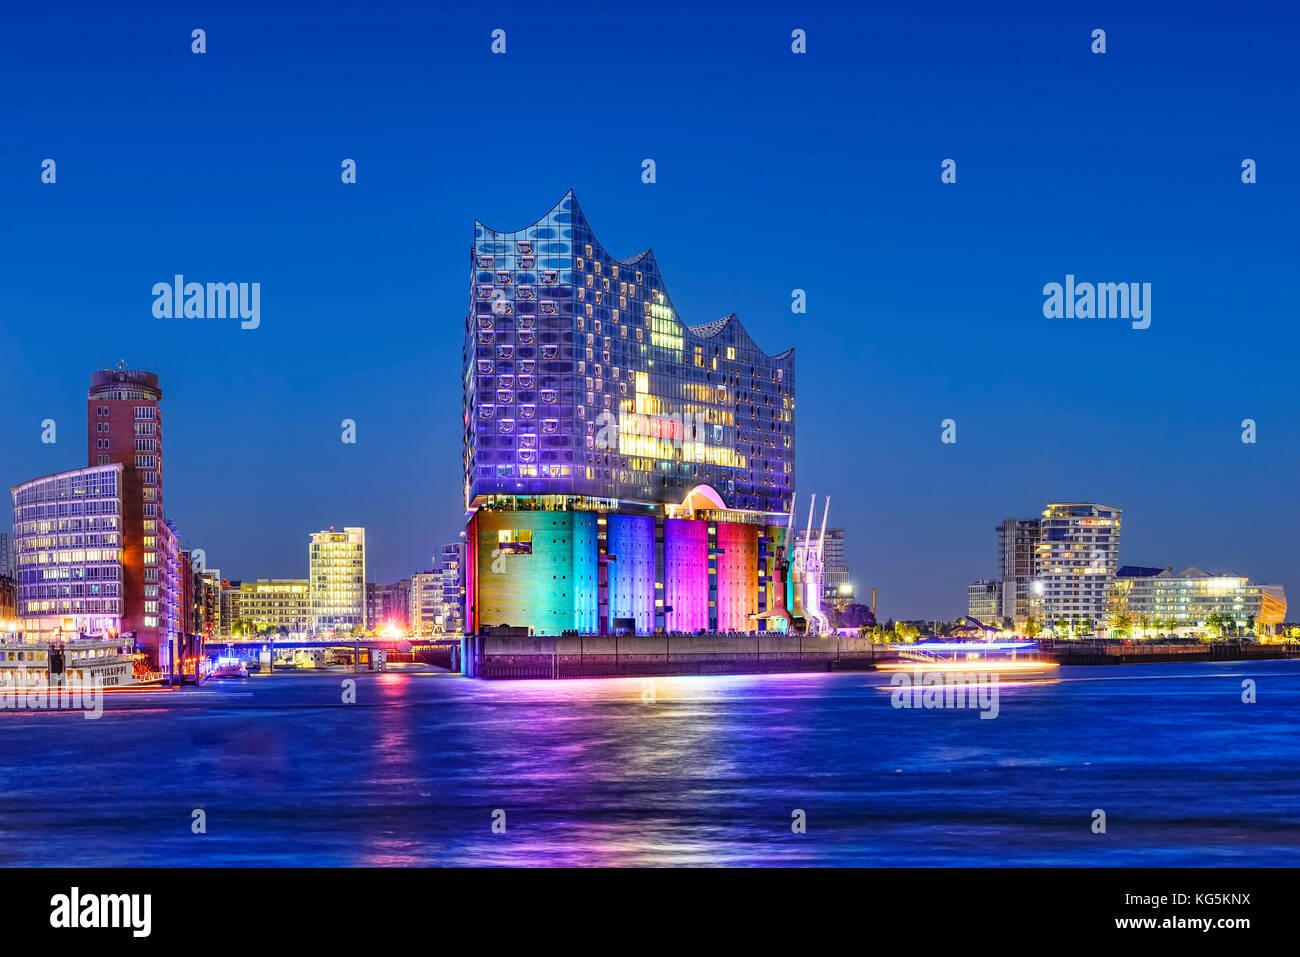 Germany, Hamburg, HafenCity, Elbphilharmonie, Imination, rainbow colors, Christopher Street Day - Stock Image